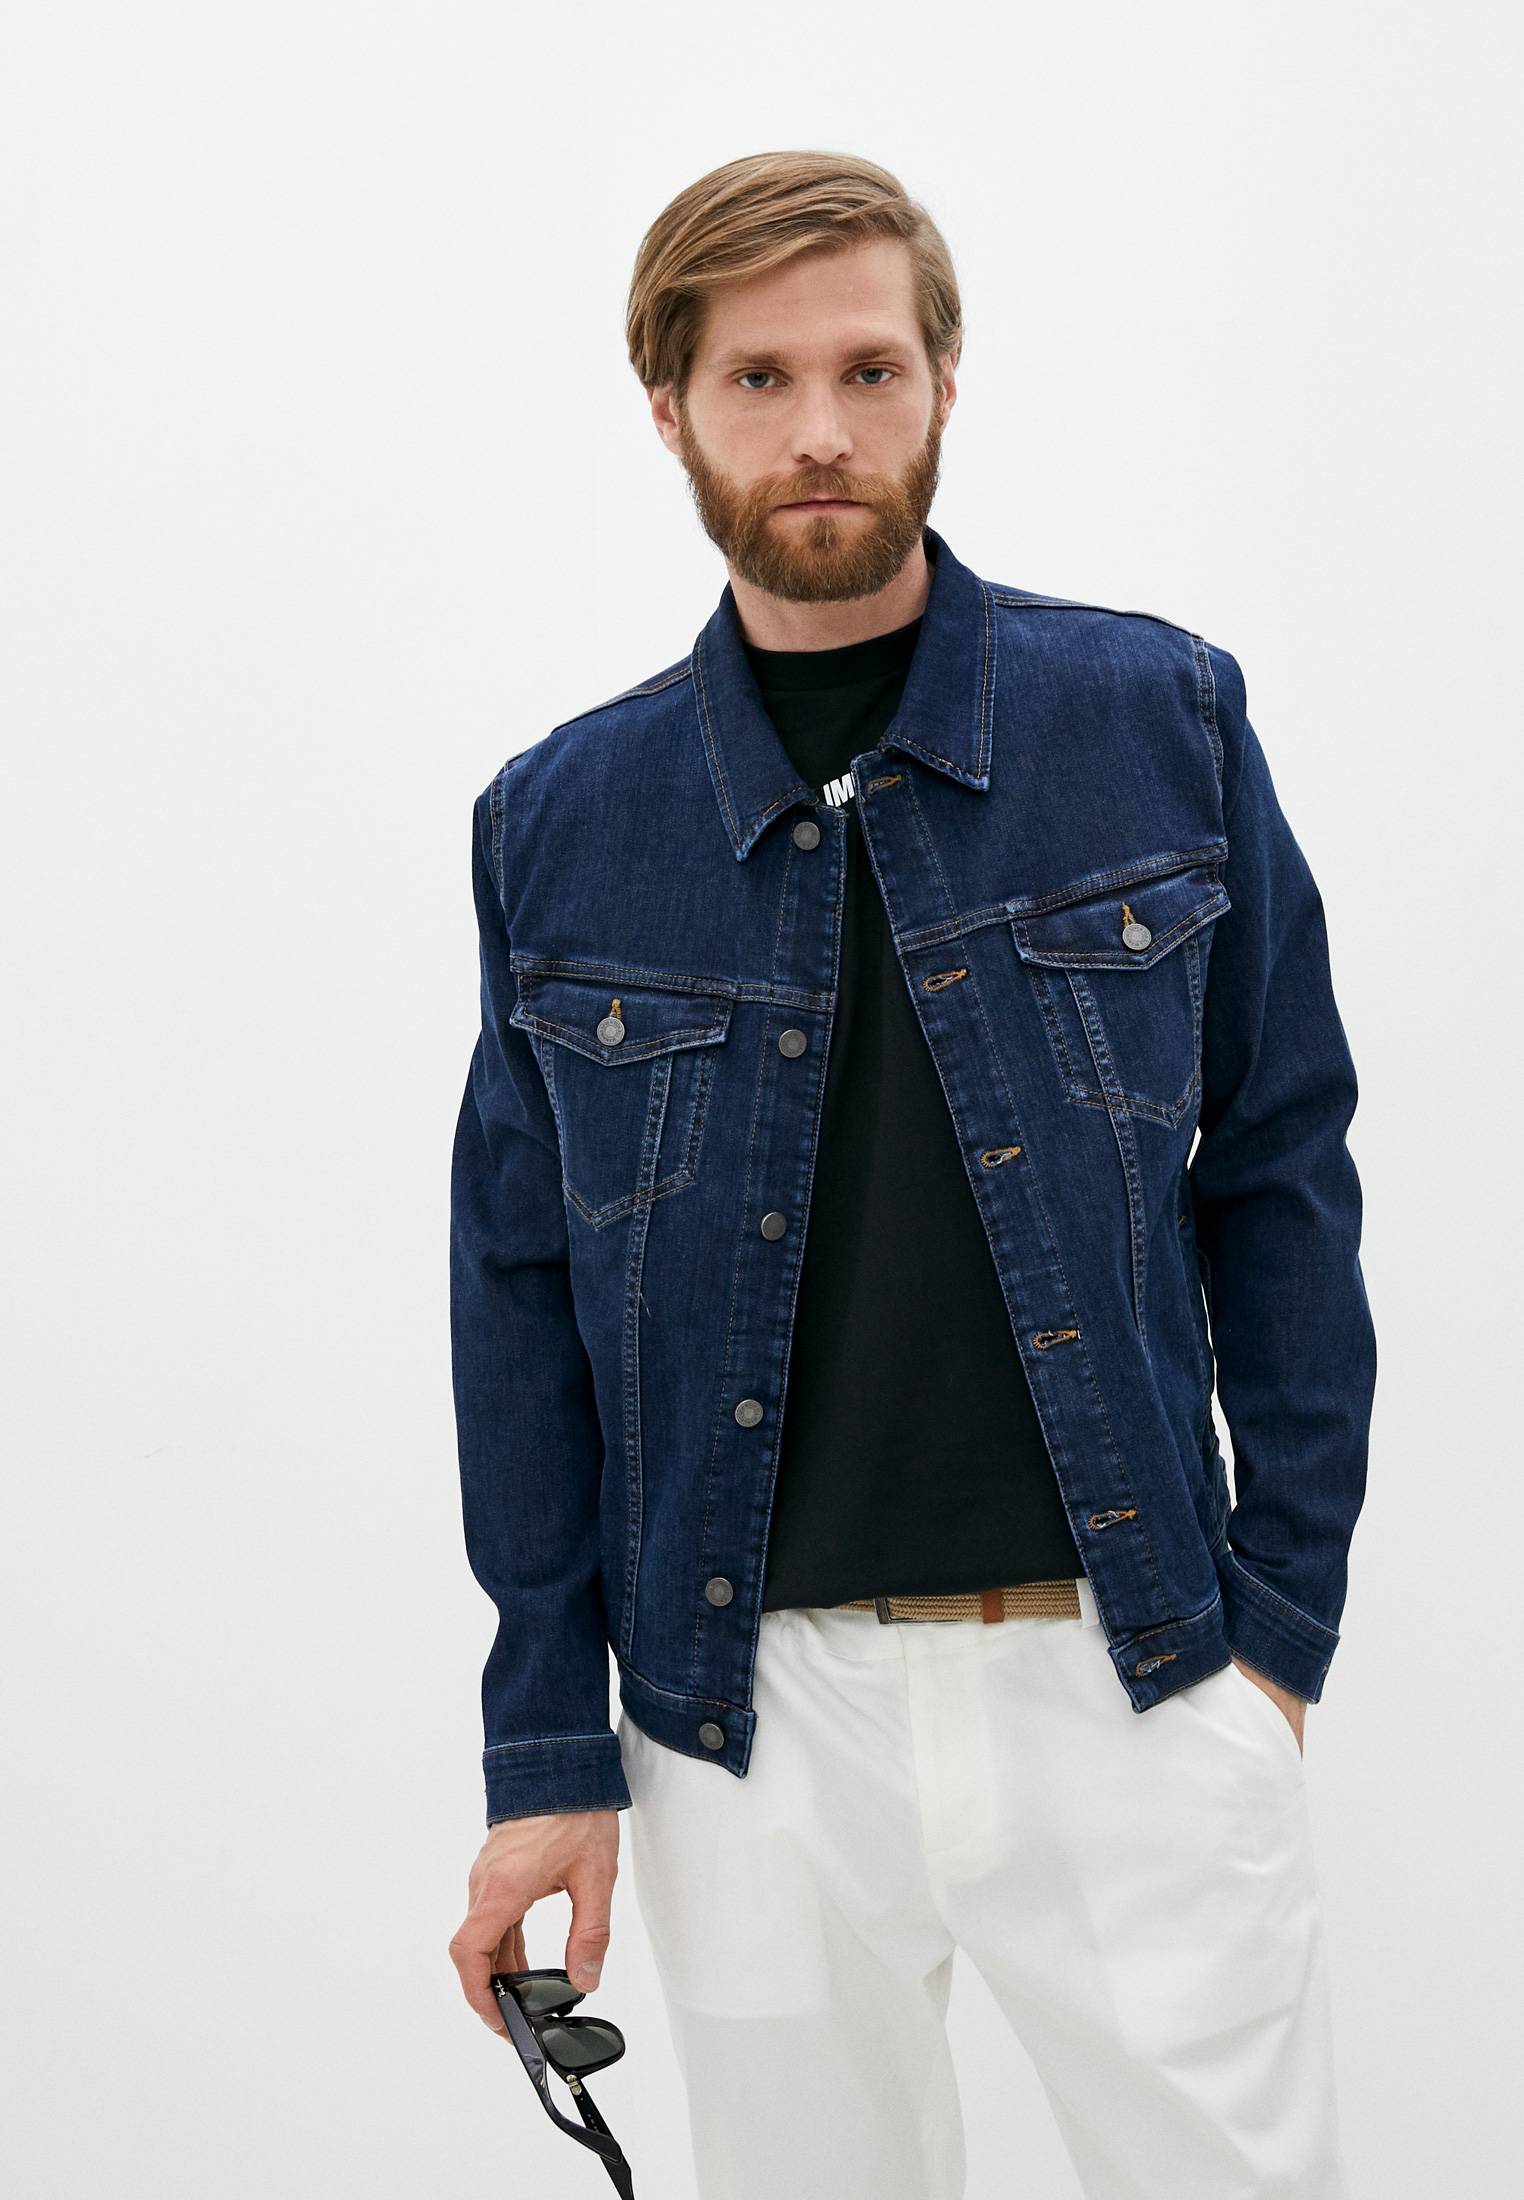 Джинсовая куртка 7 For All Mankind (7 Фо Олл Мэнкайнд) Куртка джинсовая 7 For All Mankind